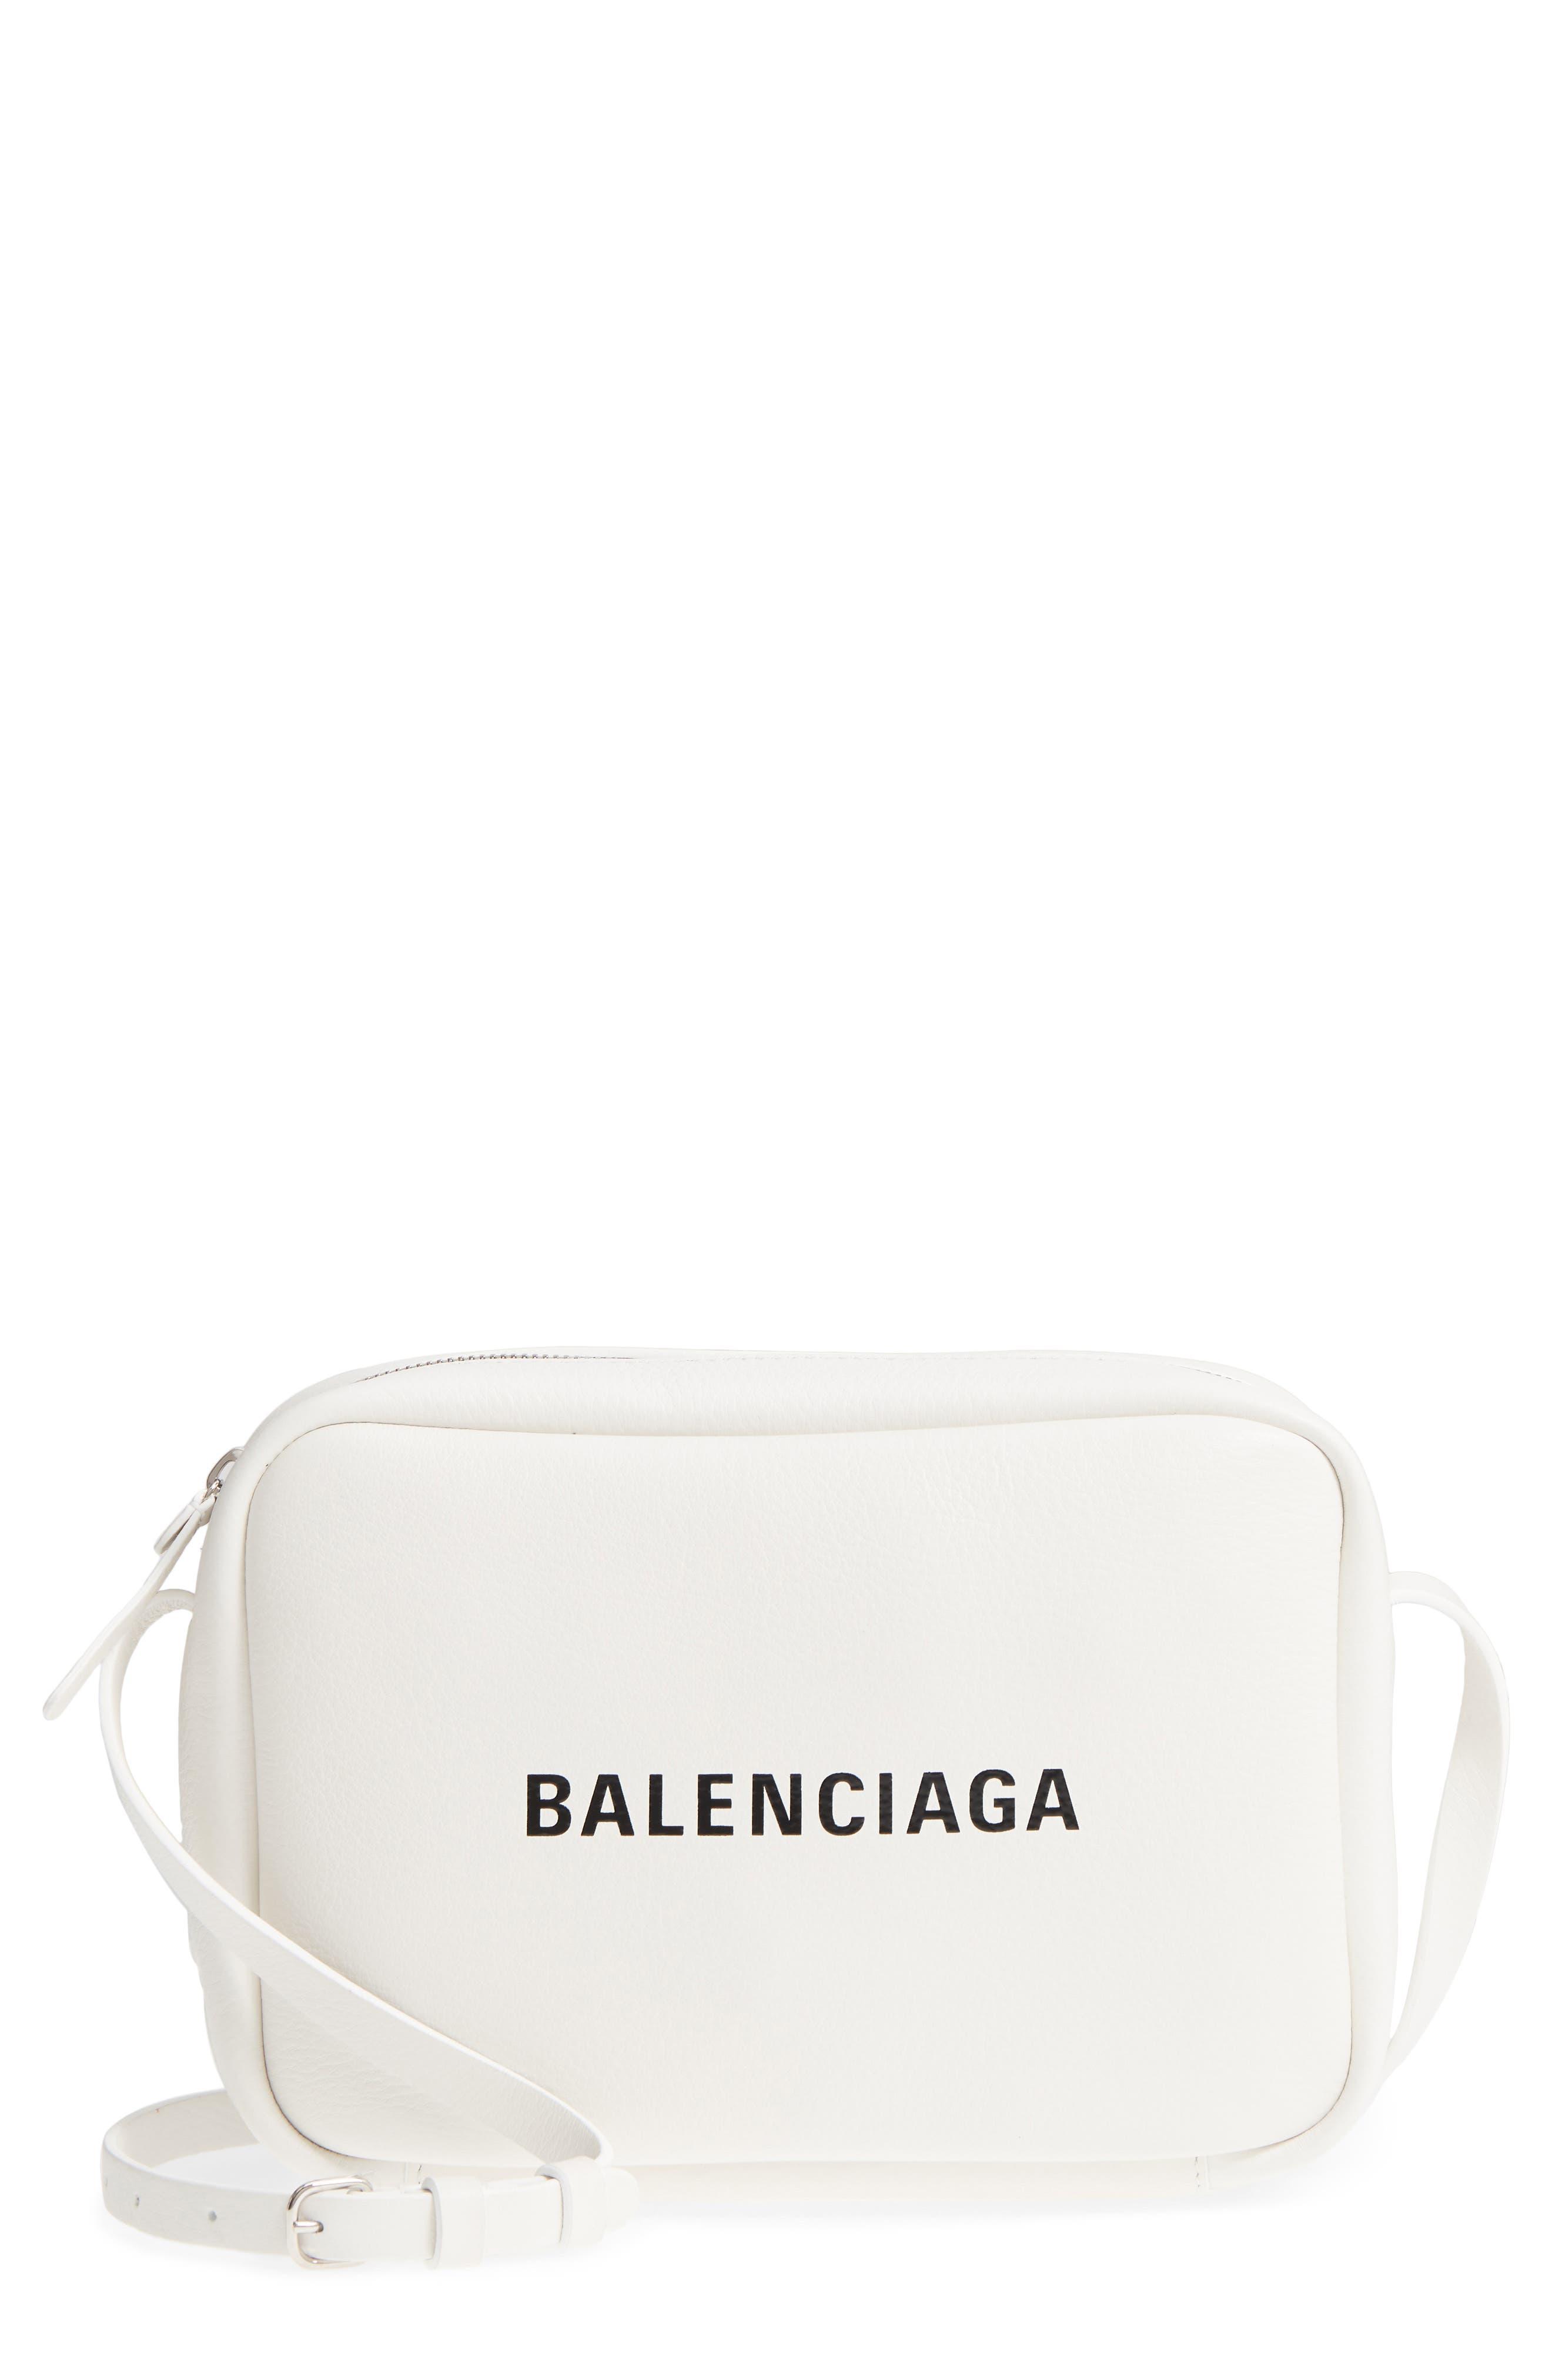 Small Everyday Calfskin Leather Camera Bag,                             Main thumbnail 1, color,                             BLANC OPTIQUE/ NOIR